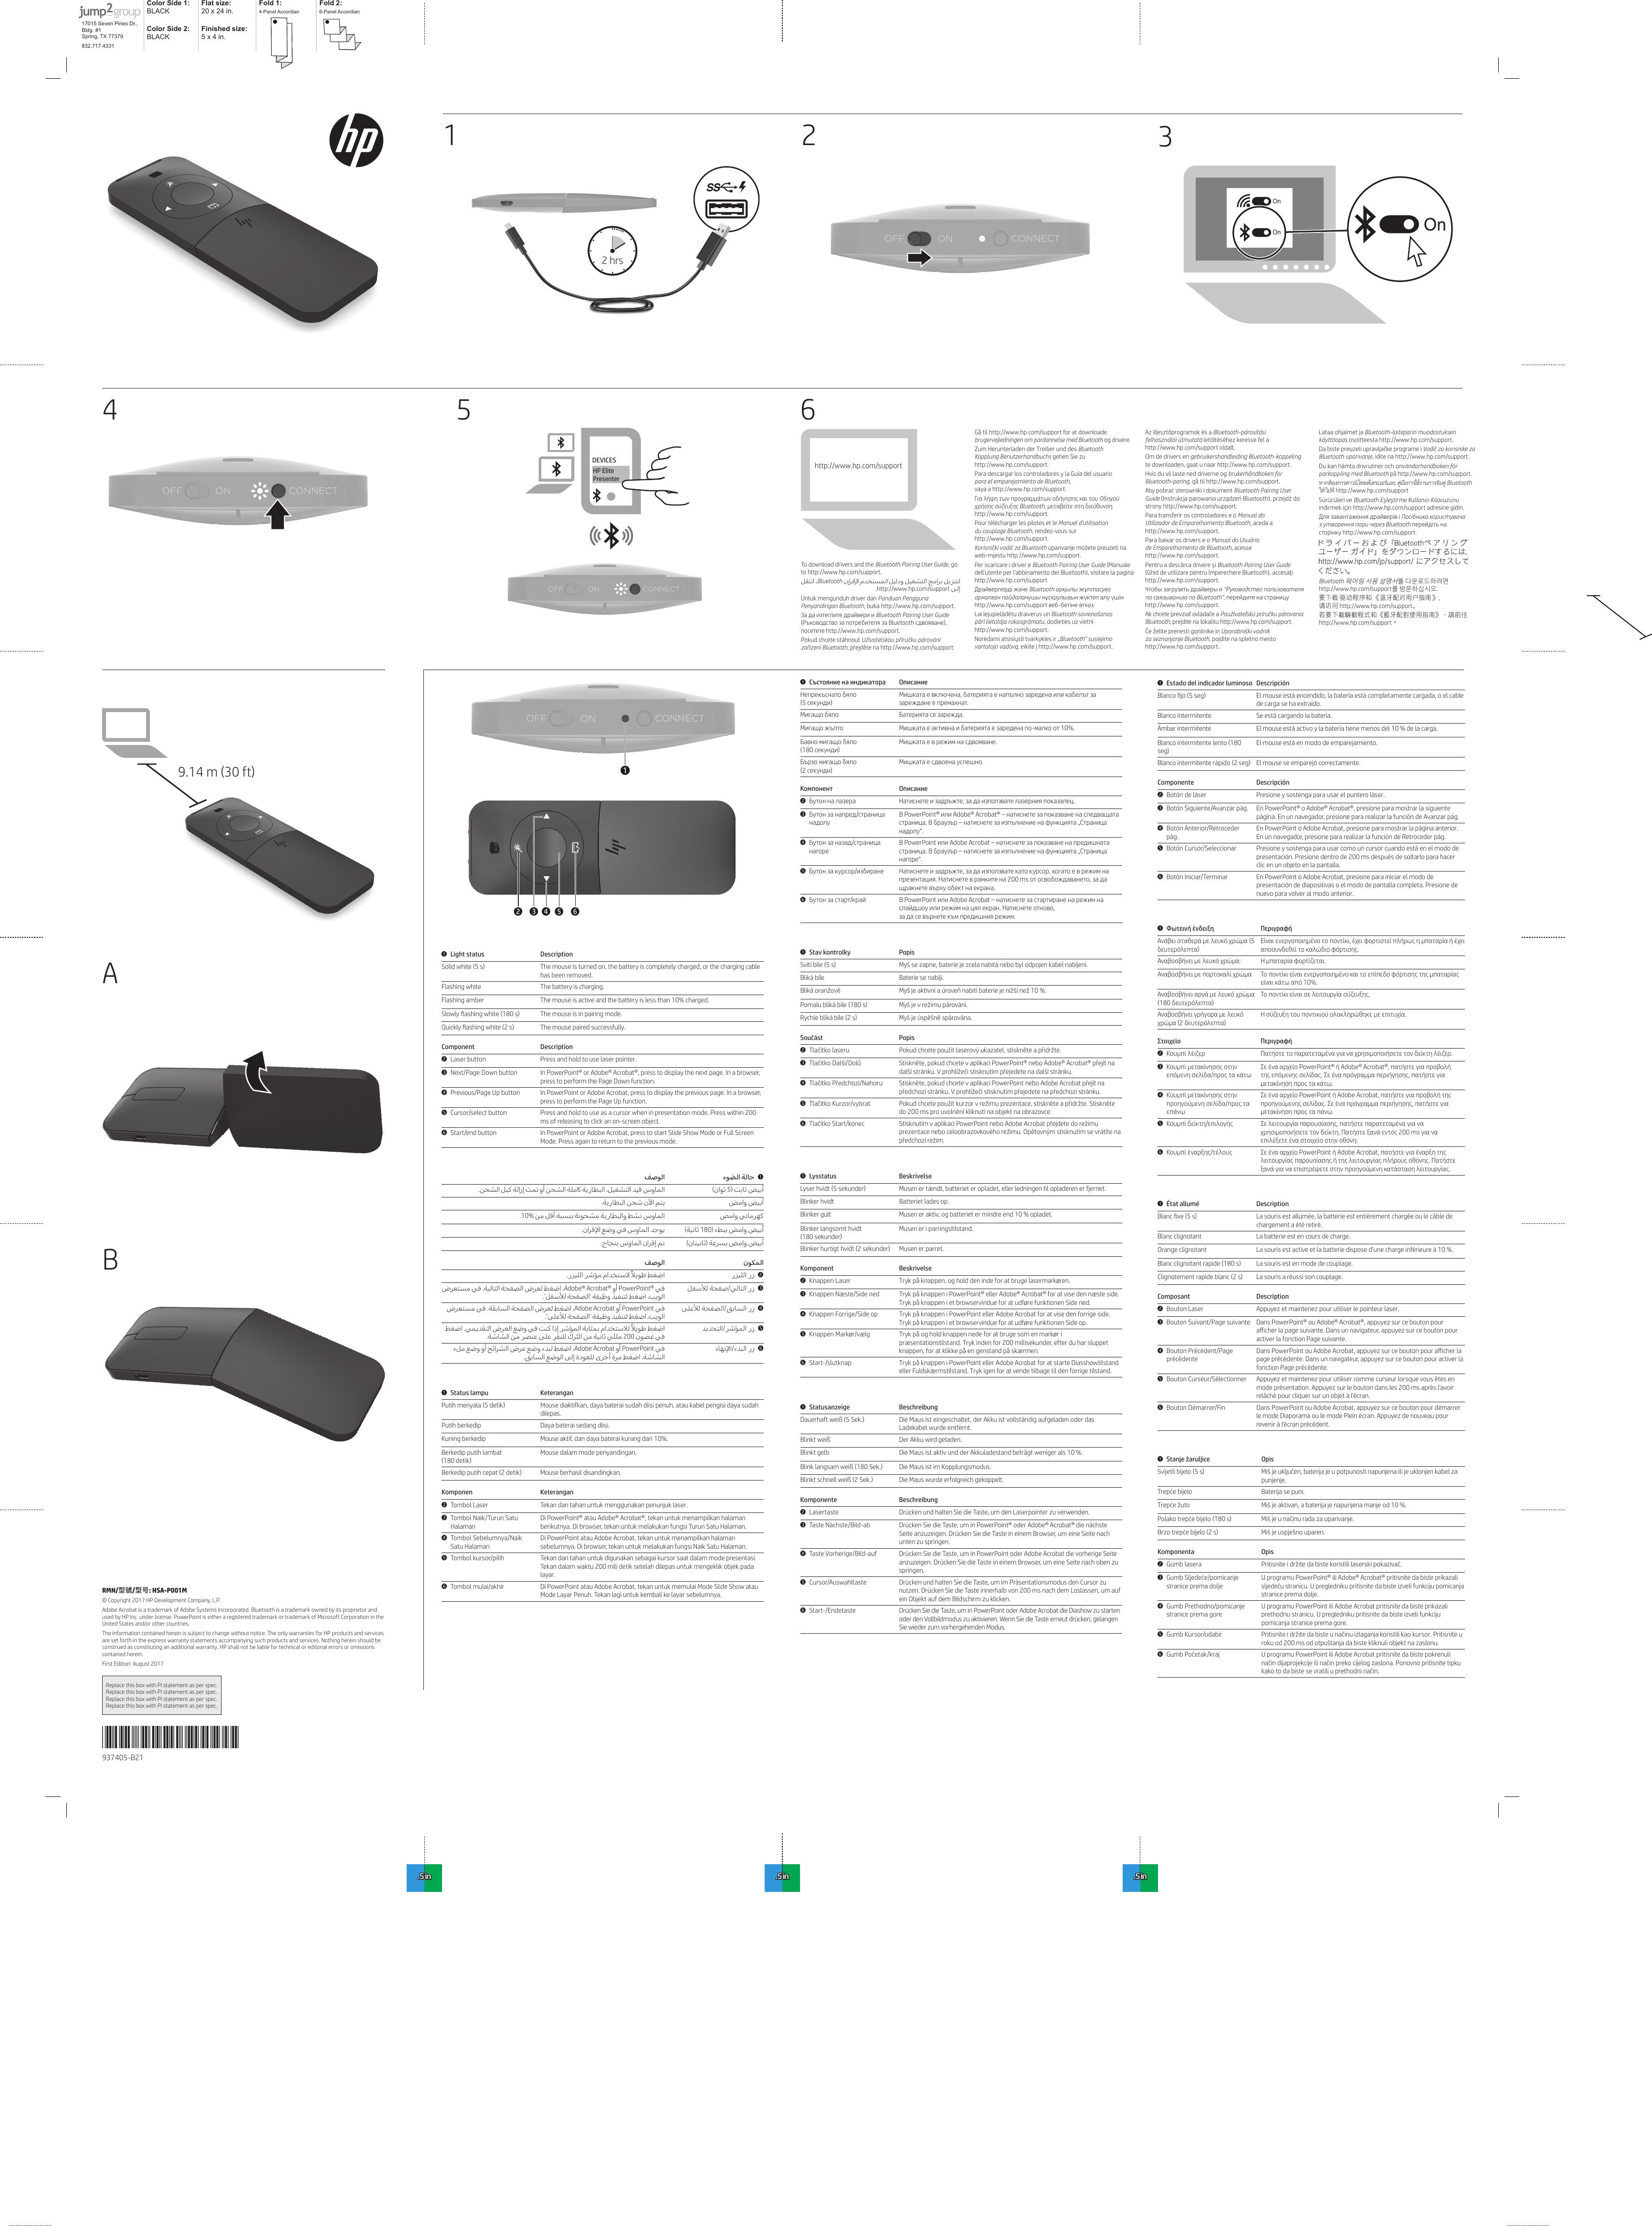 Hp manual pdf array primax electronics mhsa p001m hp elite presenter mouse user manual rh usermanual wiki fandeluxe Choice Image